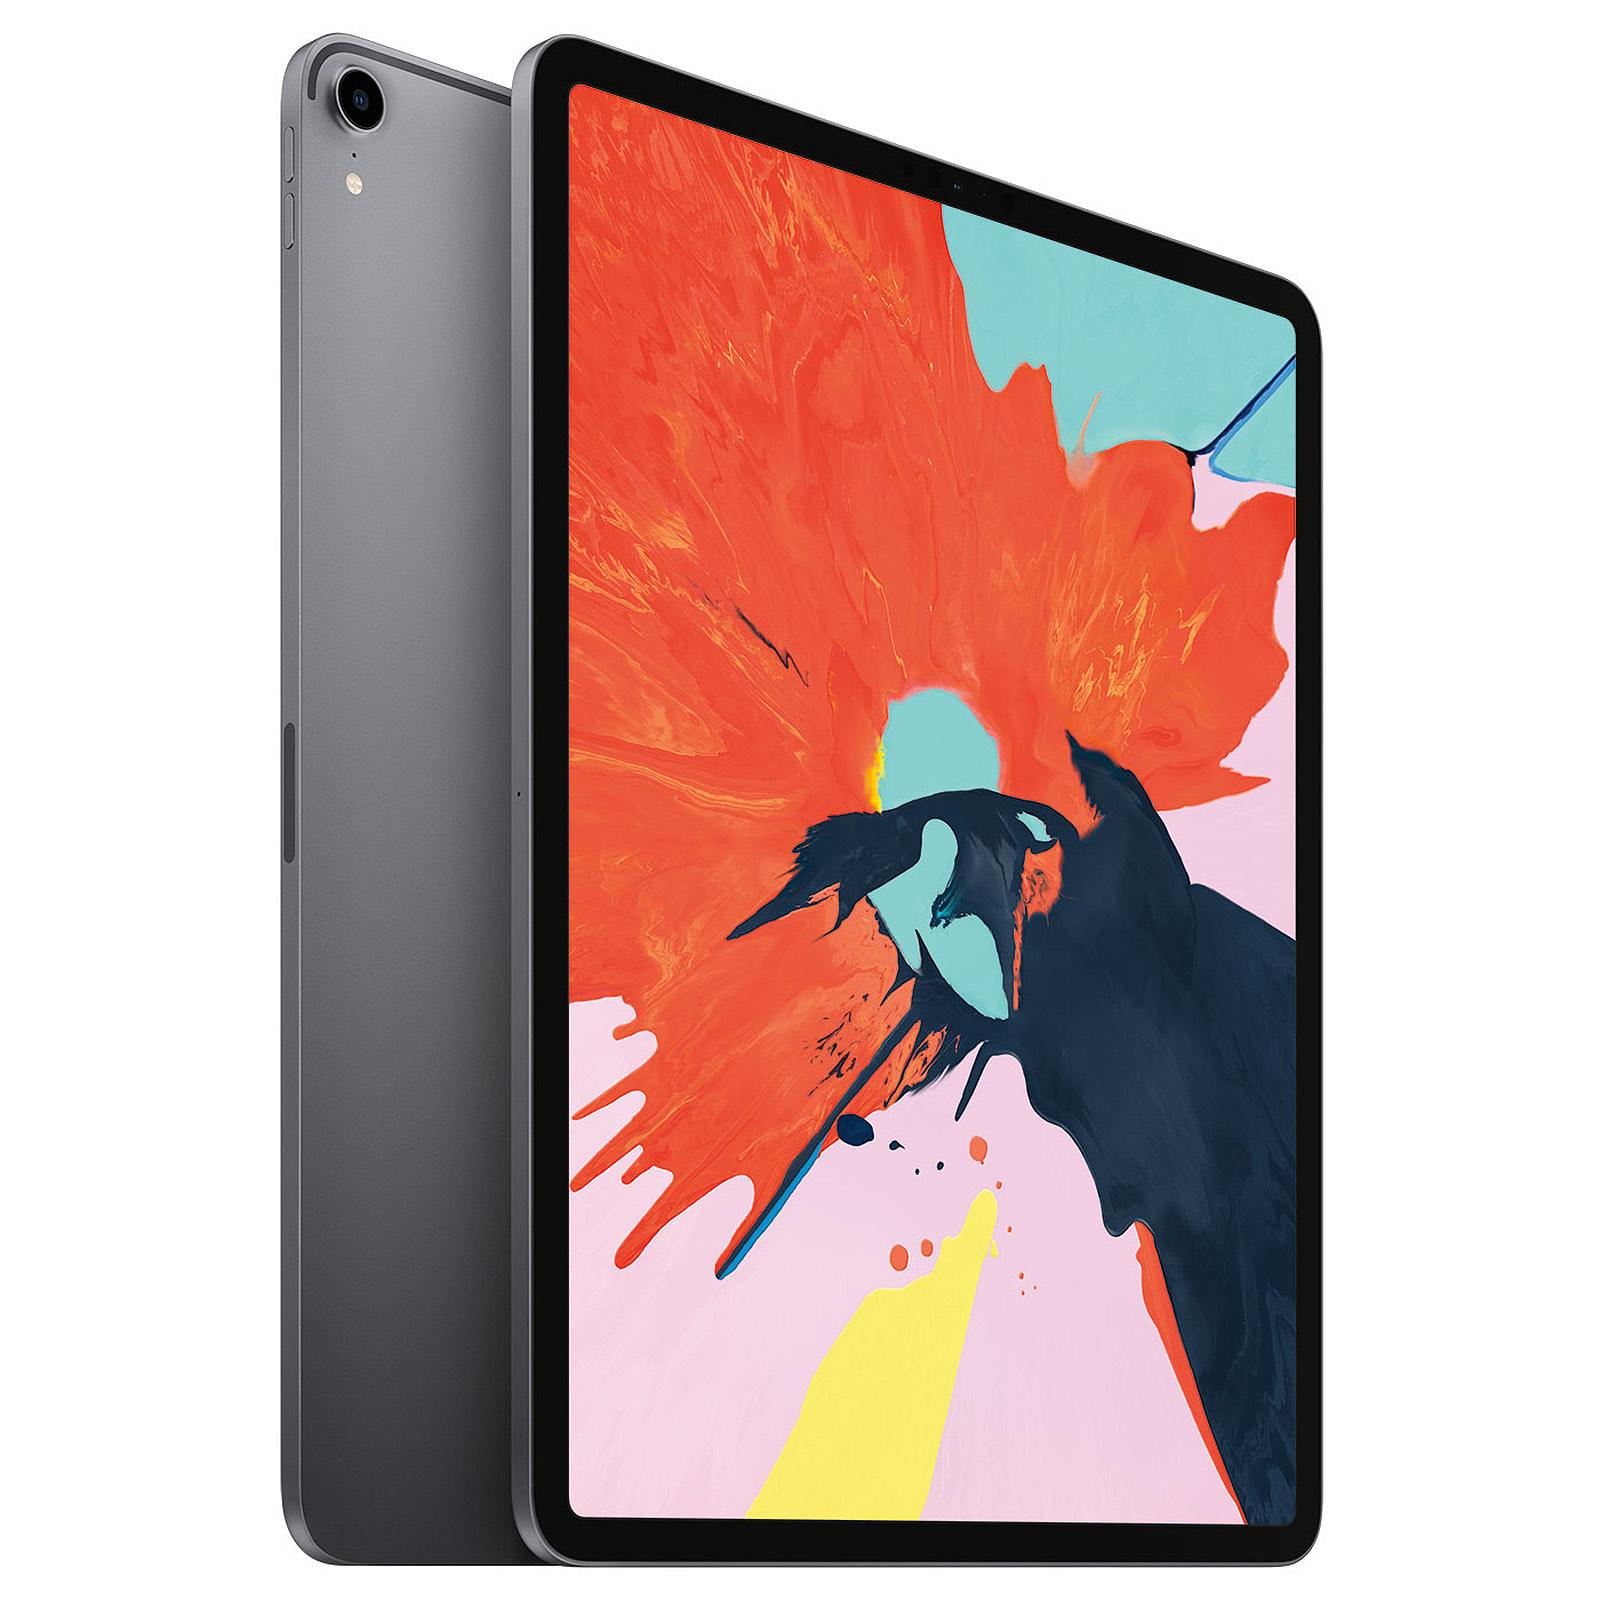 "Tablette 11"" Apple iPad Pro WiFi - 64 Go, Bluetooth 5.0 - Gris sidéral (759,99 € avec le code BF12100)"